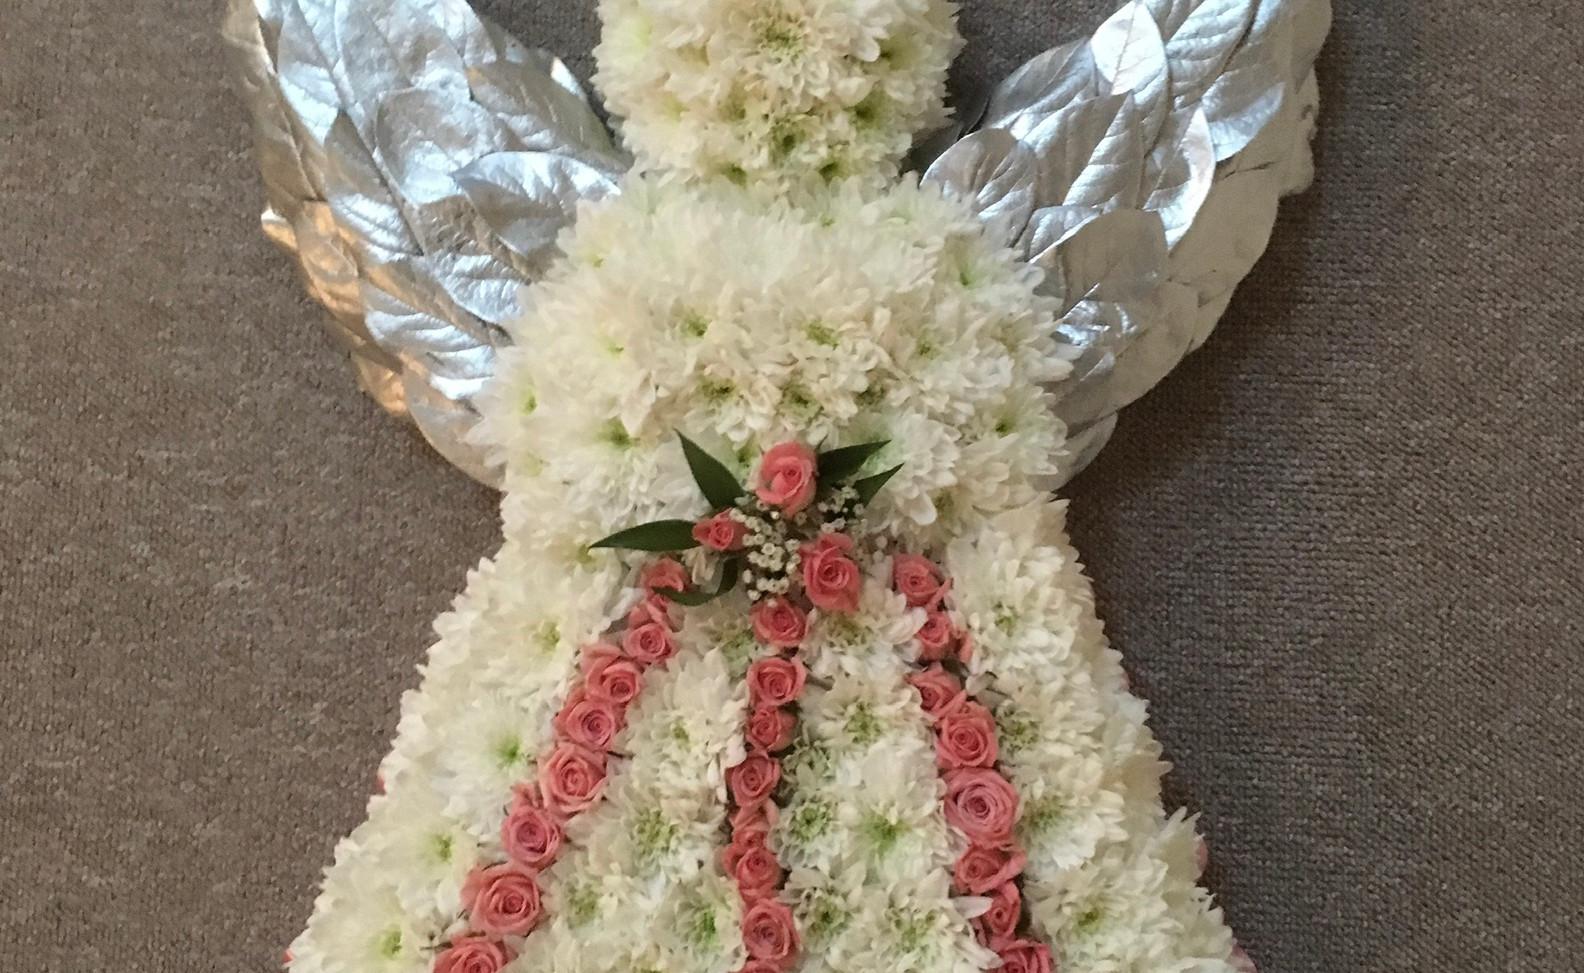 Bespoke Floral Tribute - Angel